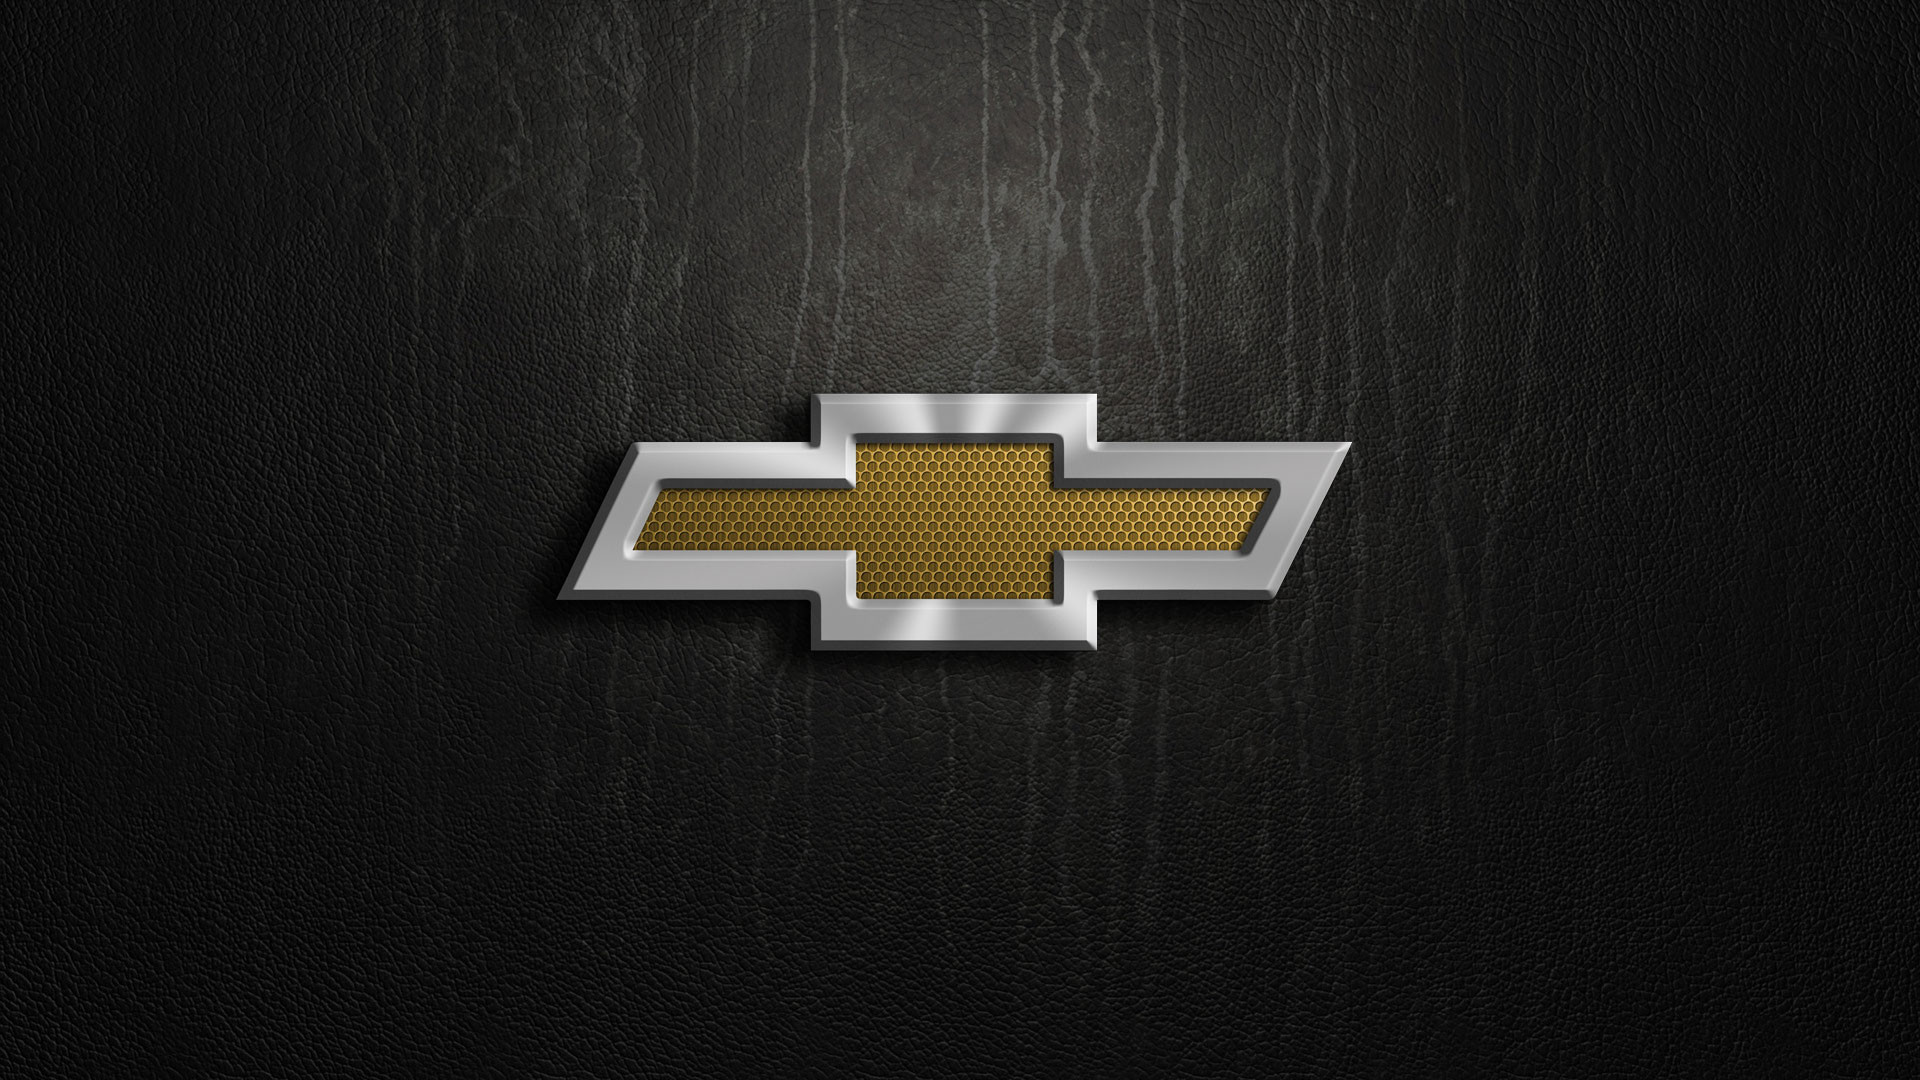 1920x1080 chevrolet leather 2014 logo free hd wallpapers 7498 hd wallpaper